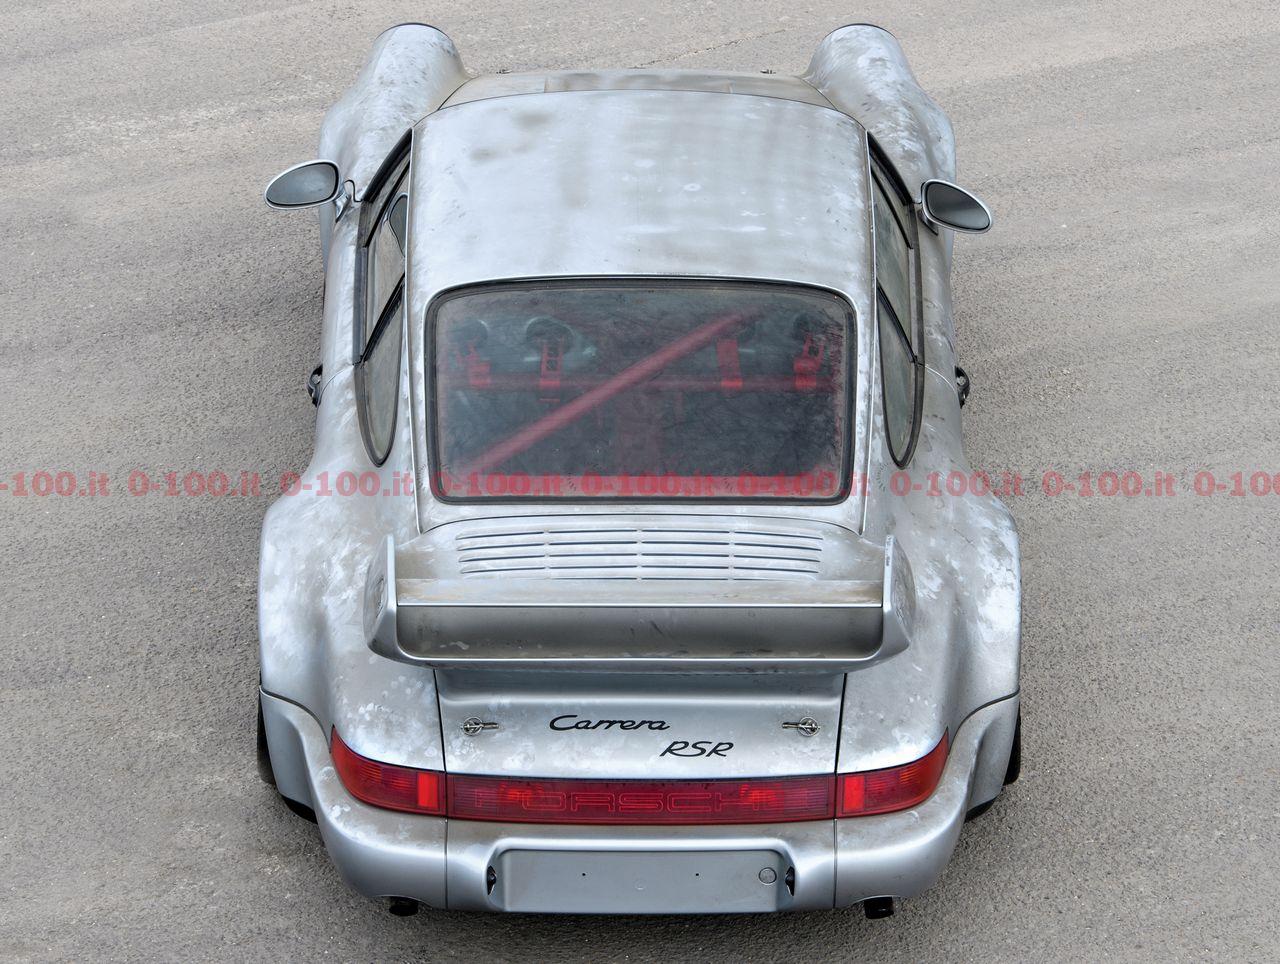 porsche-964-carrera-rsr-3800-0-100_10